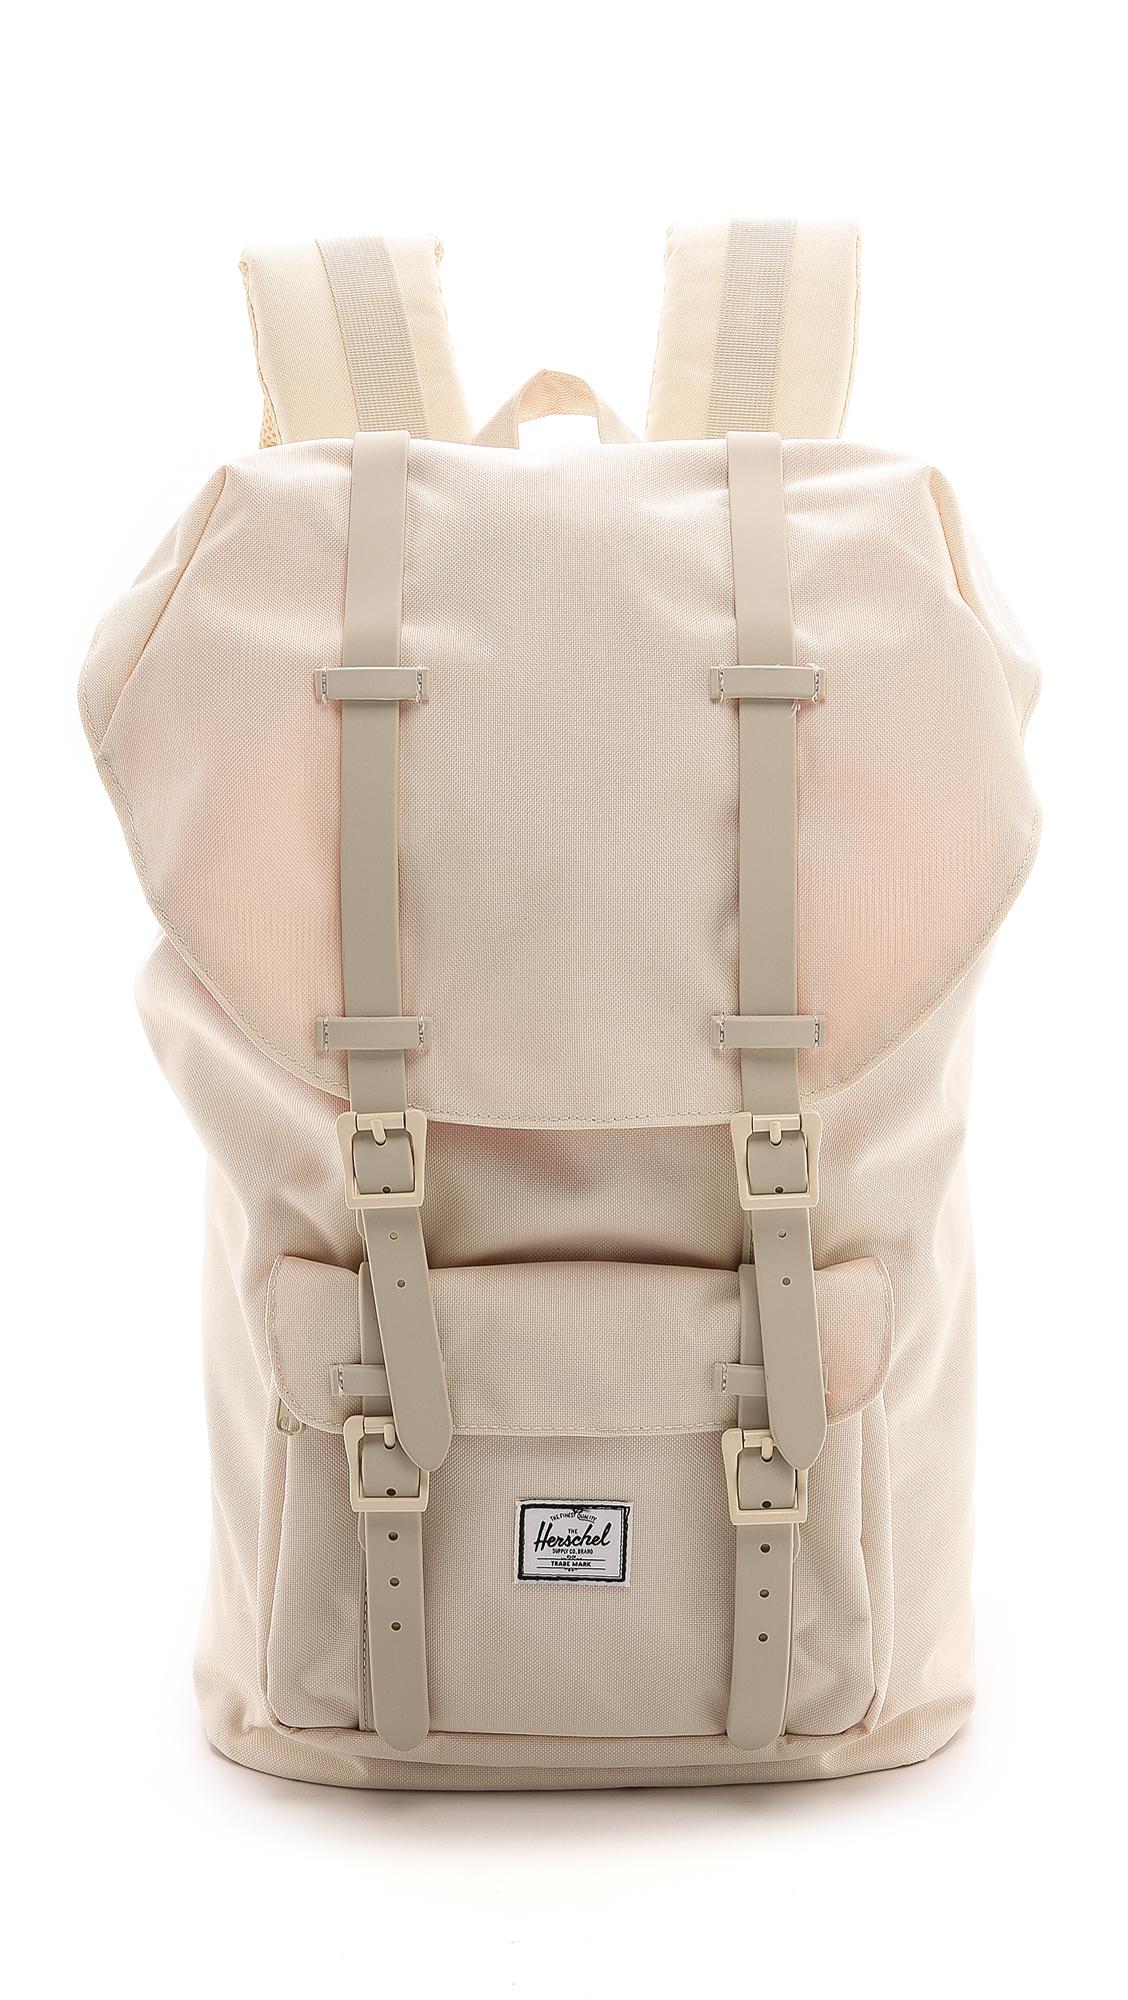 herschel supply co little america classic backpack in natural for men lyst. Black Bedroom Furniture Sets. Home Design Ideas